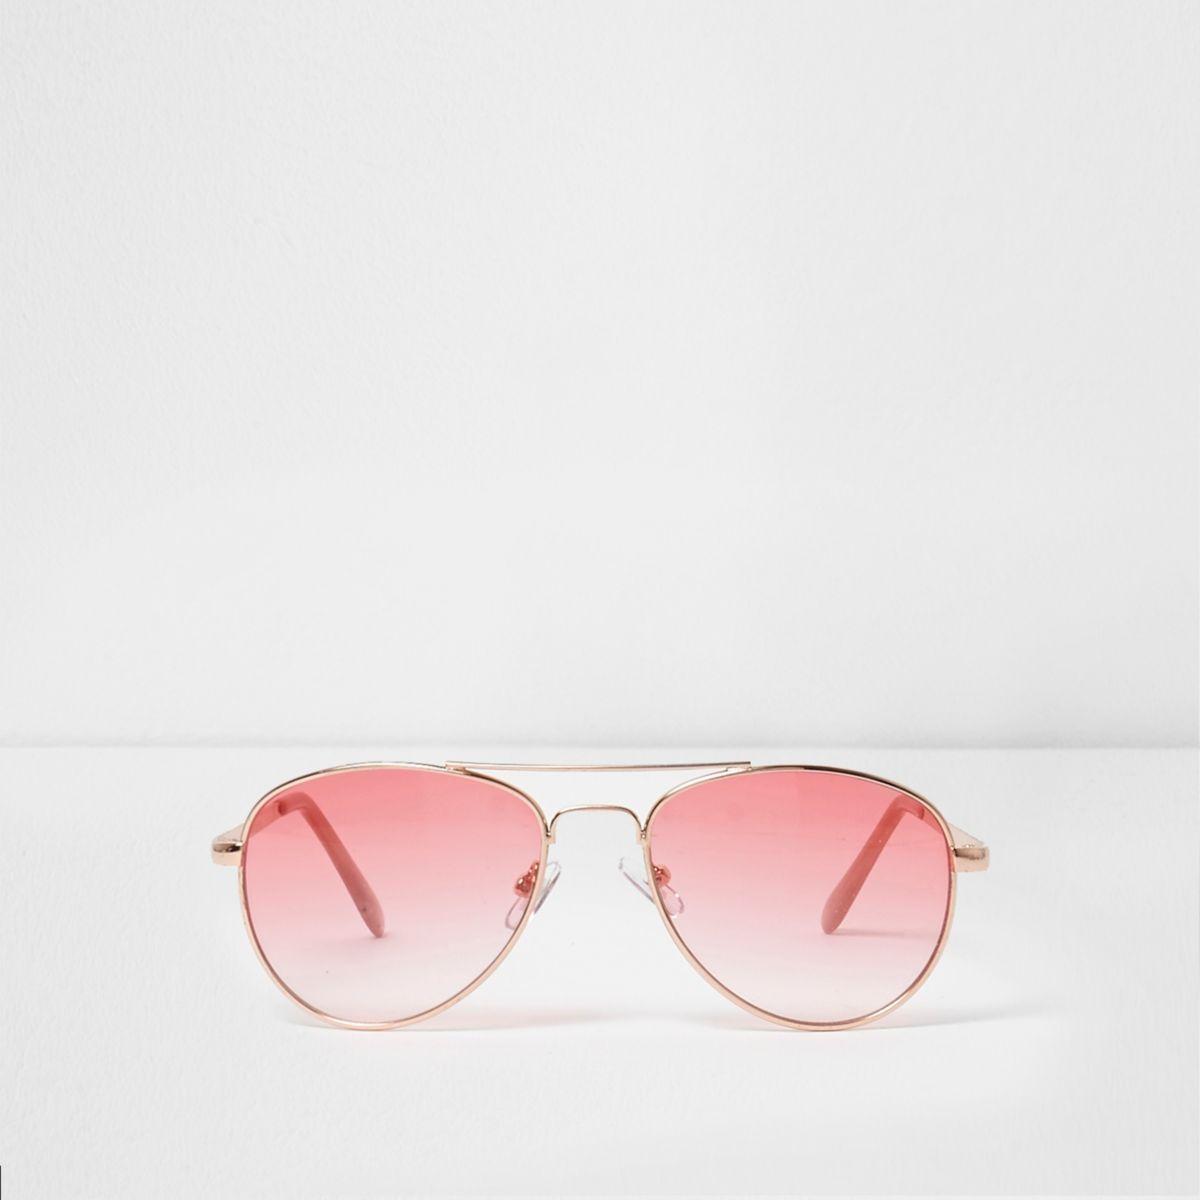 Girls pink clear lens aviator sunglasses